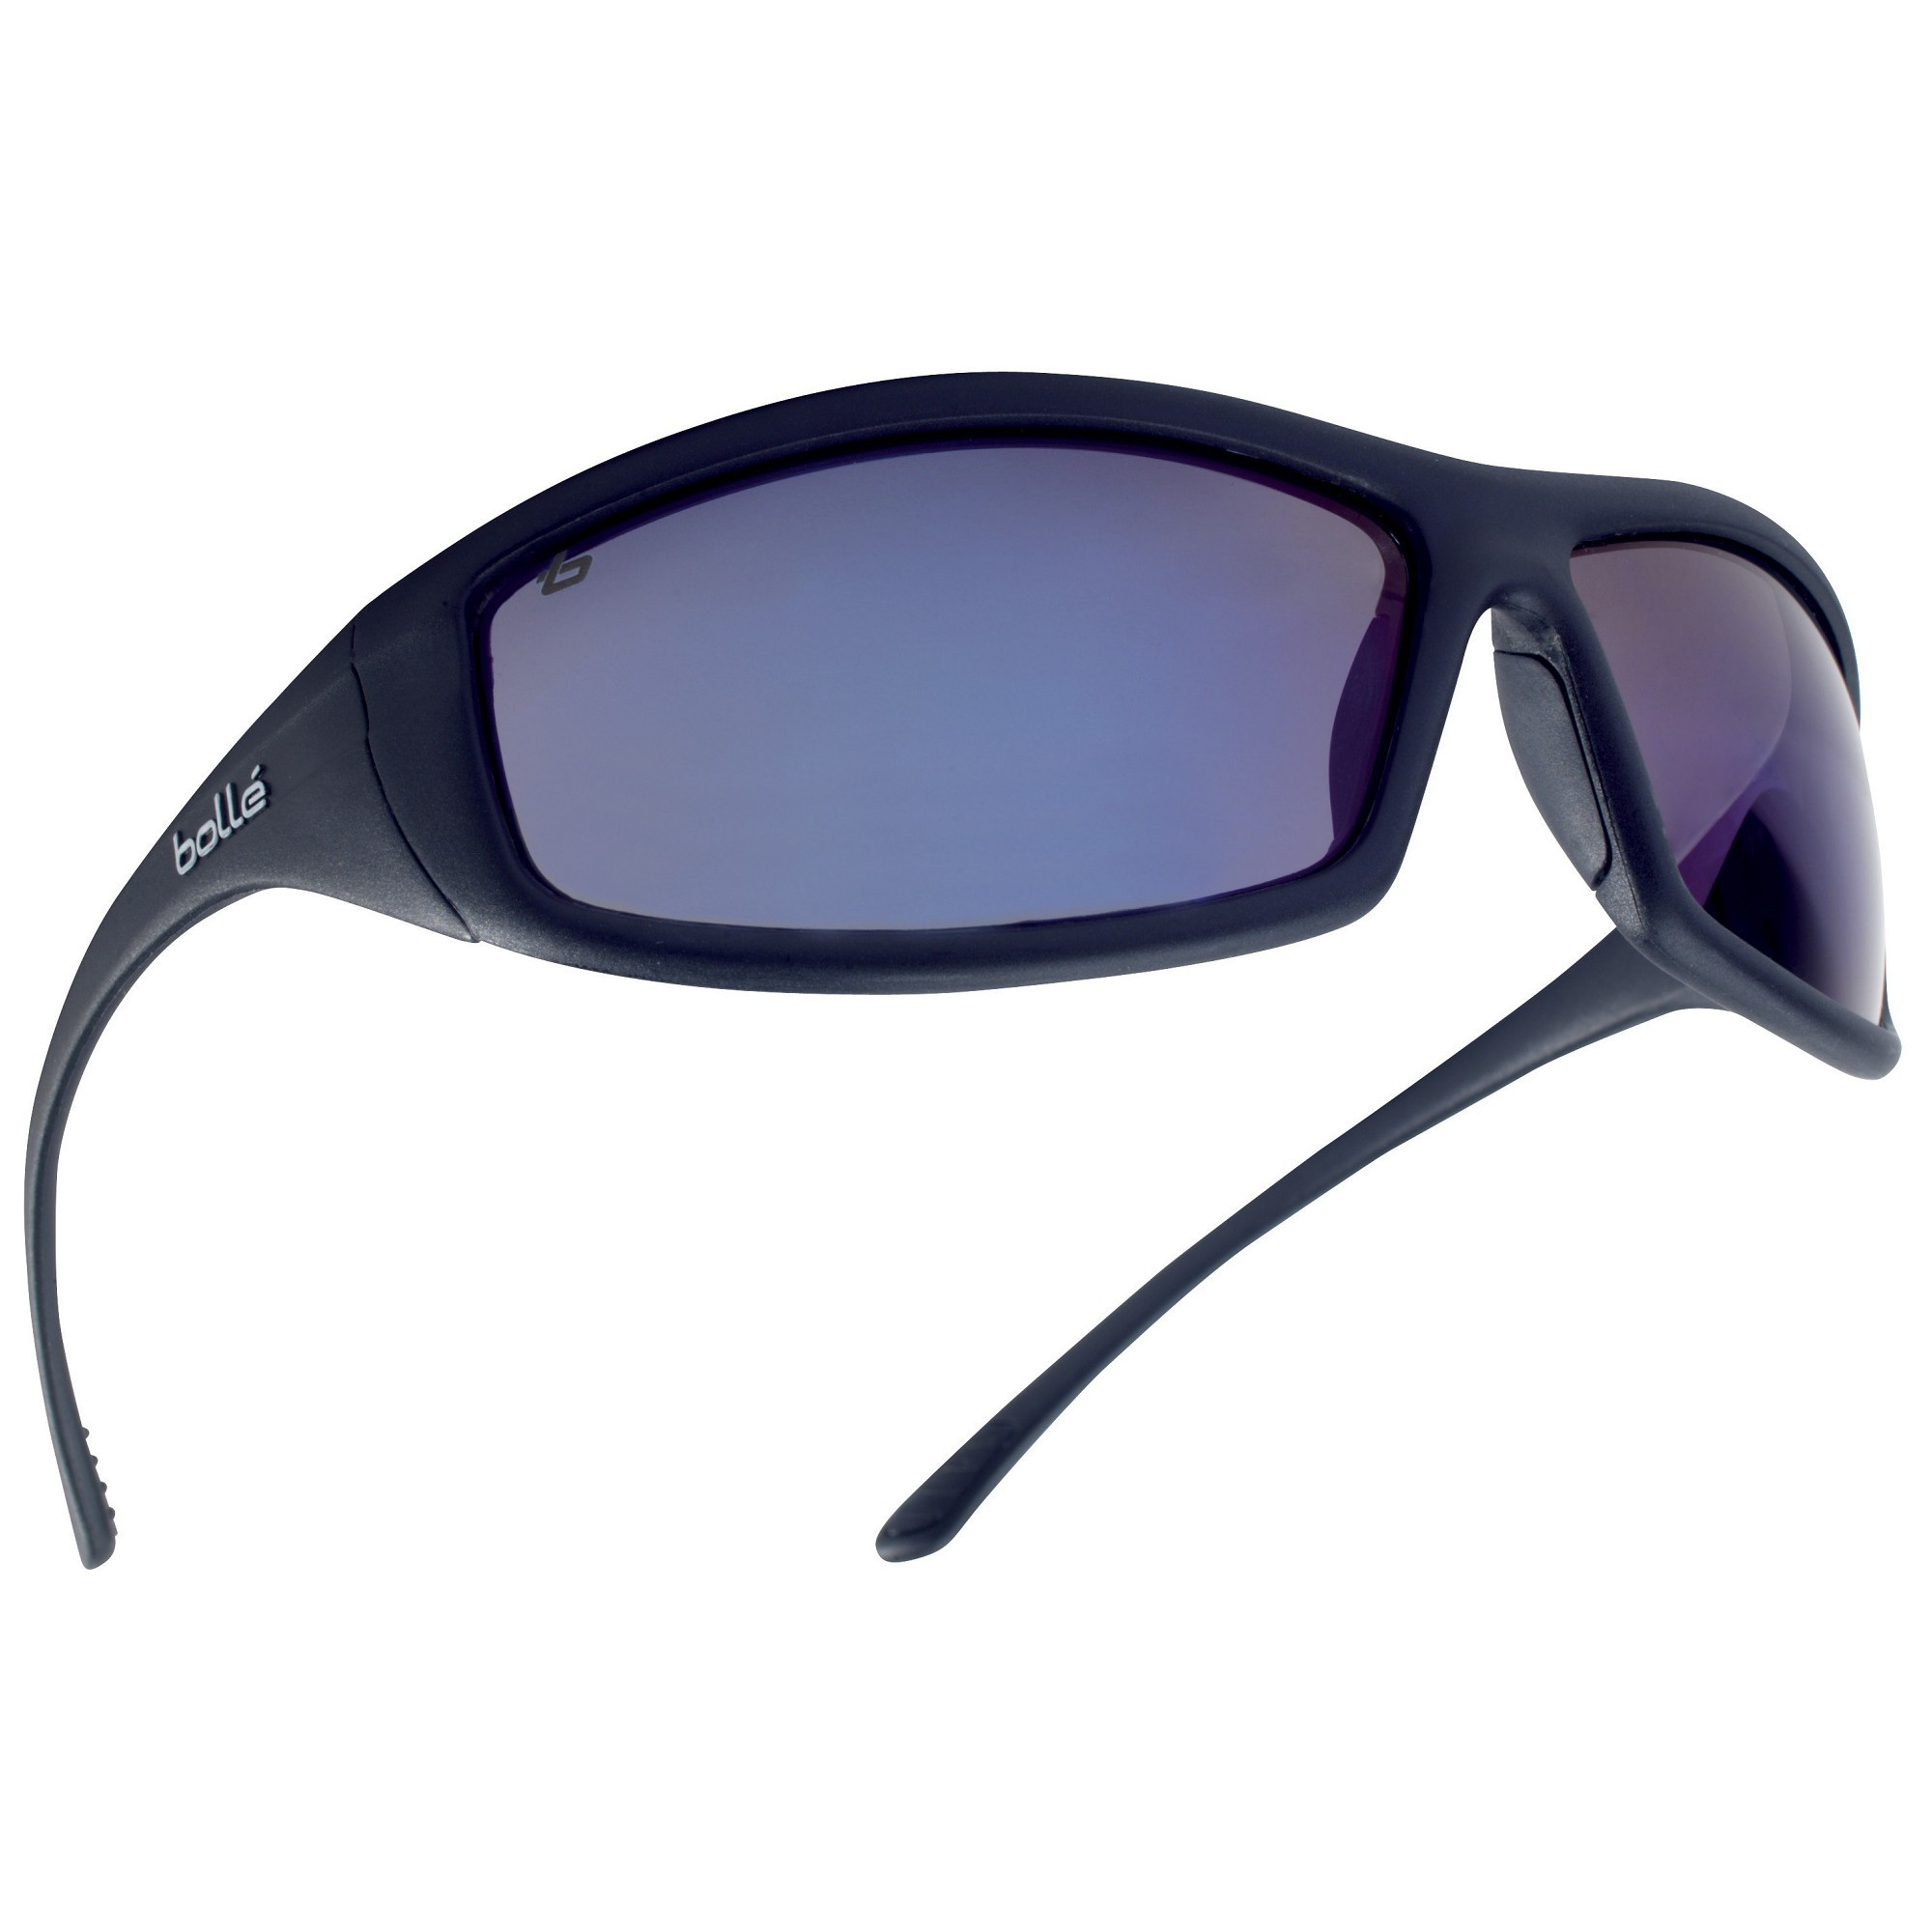 Anti Scratch Safety Glasses Amazon